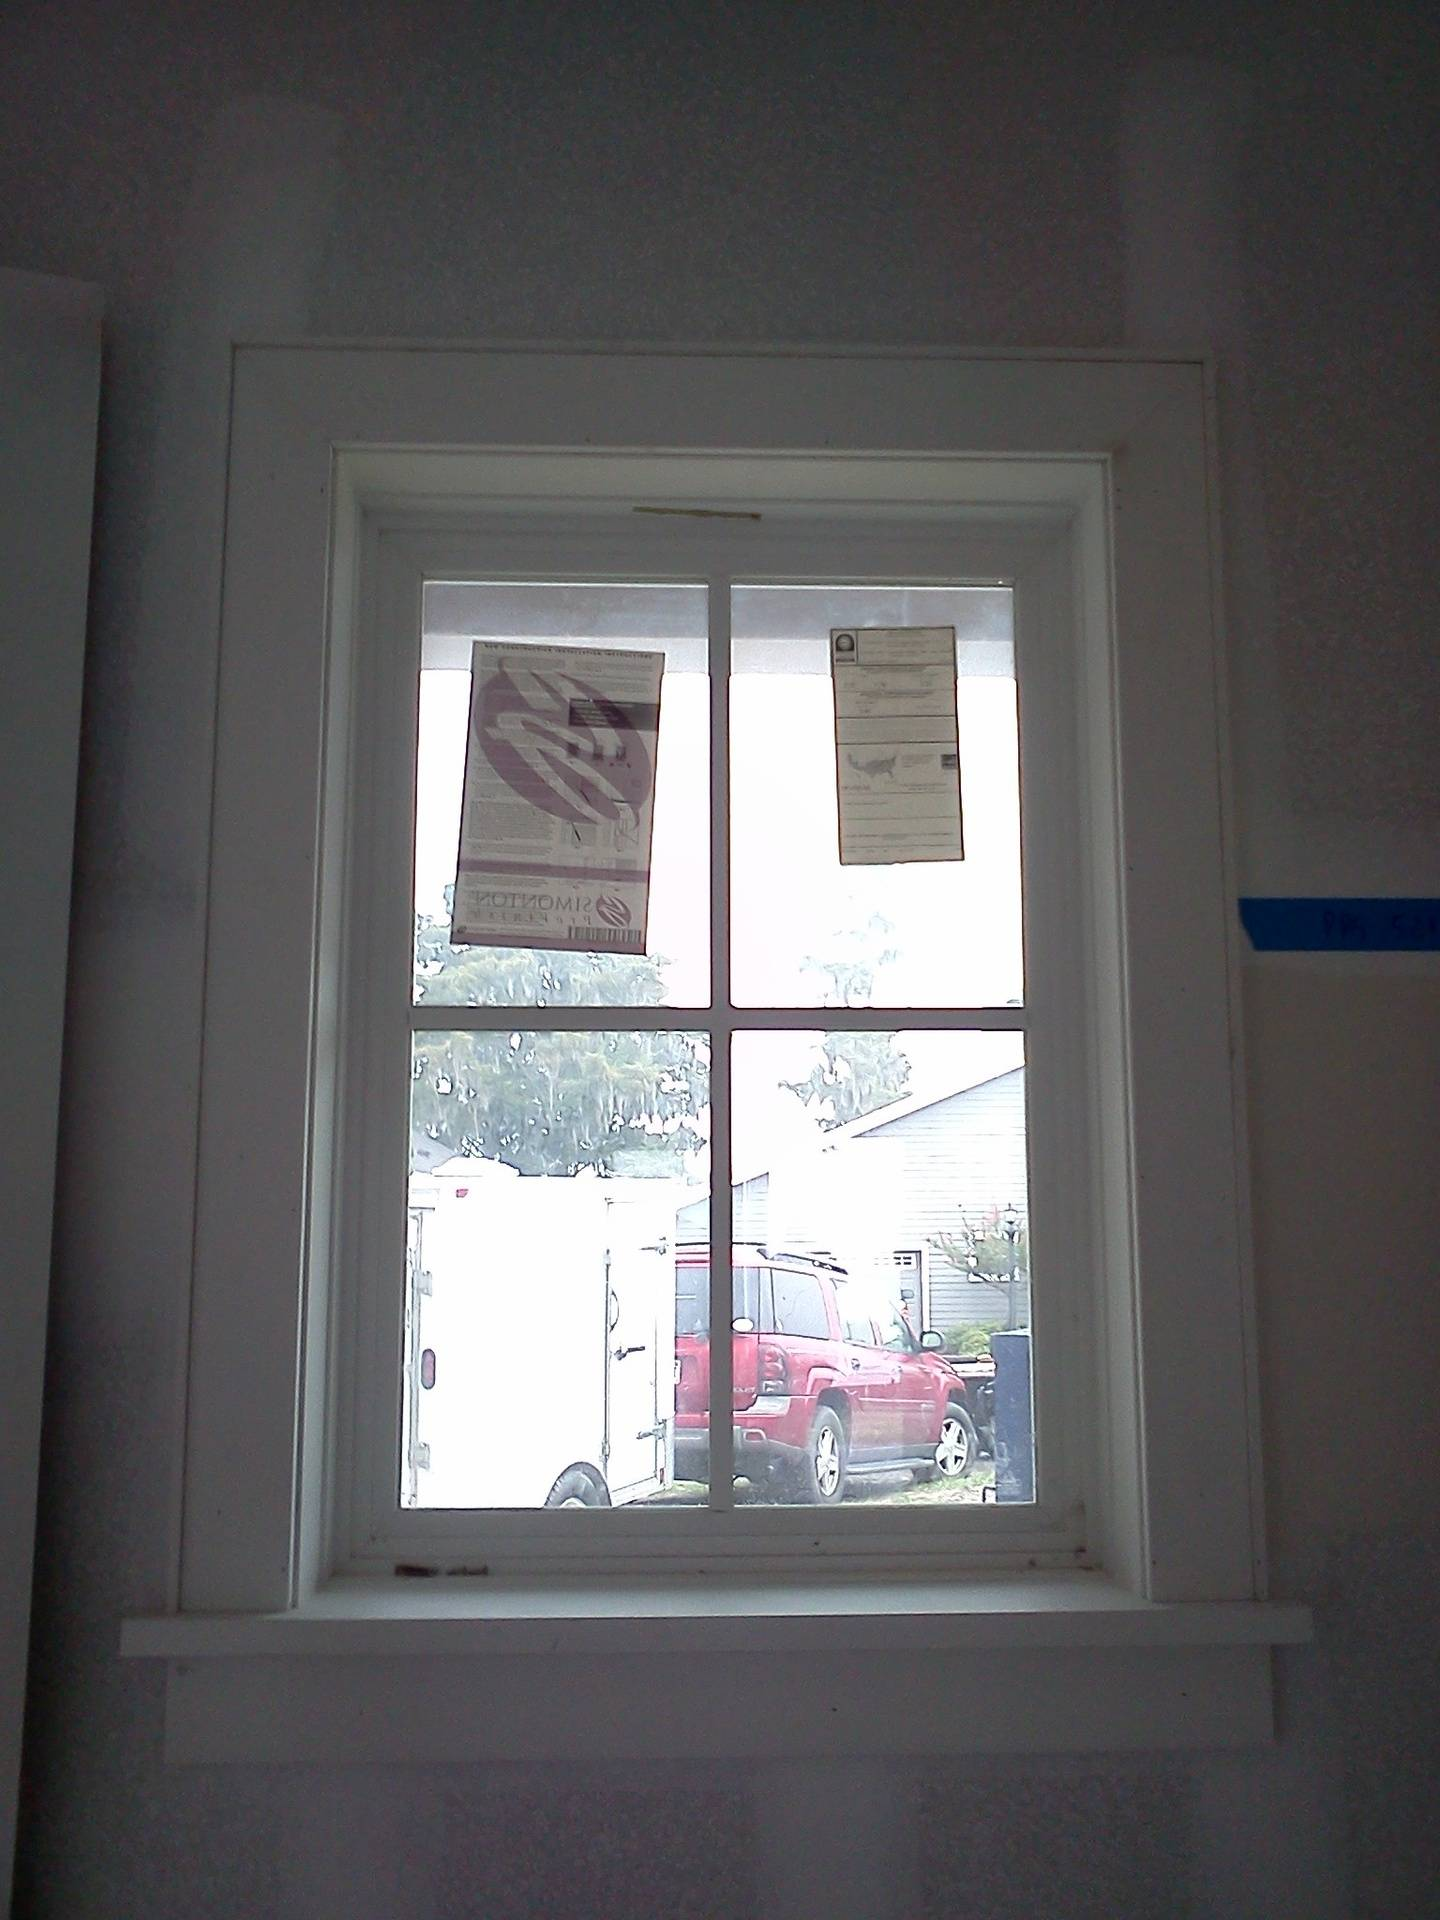 Window Sill and Trim